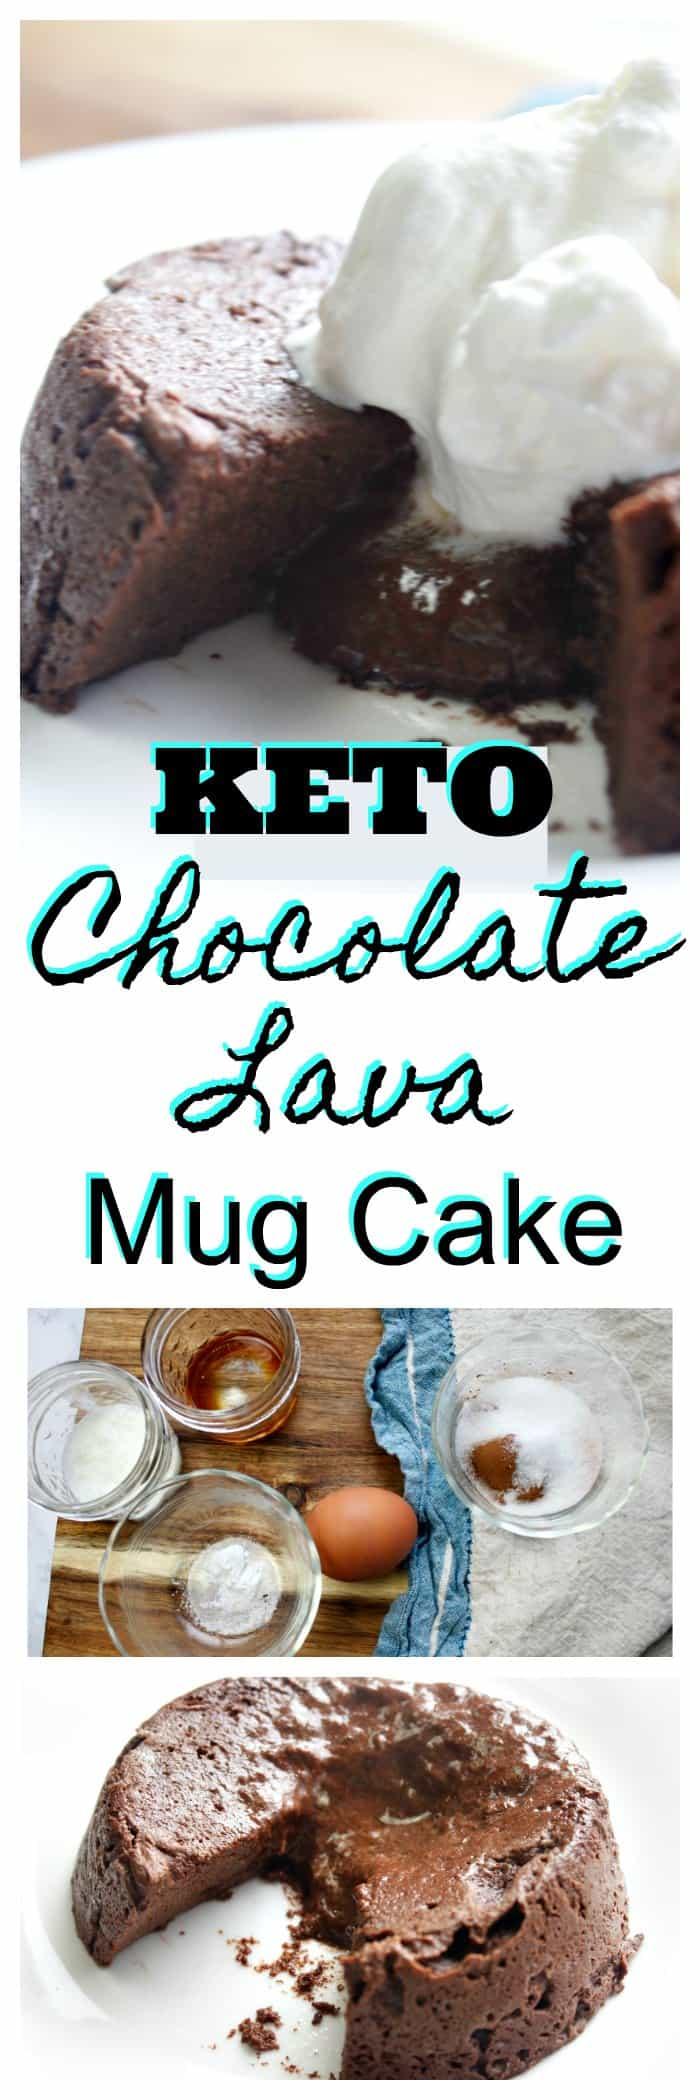 Keto Chocolate Lava Mug Cake Recipe